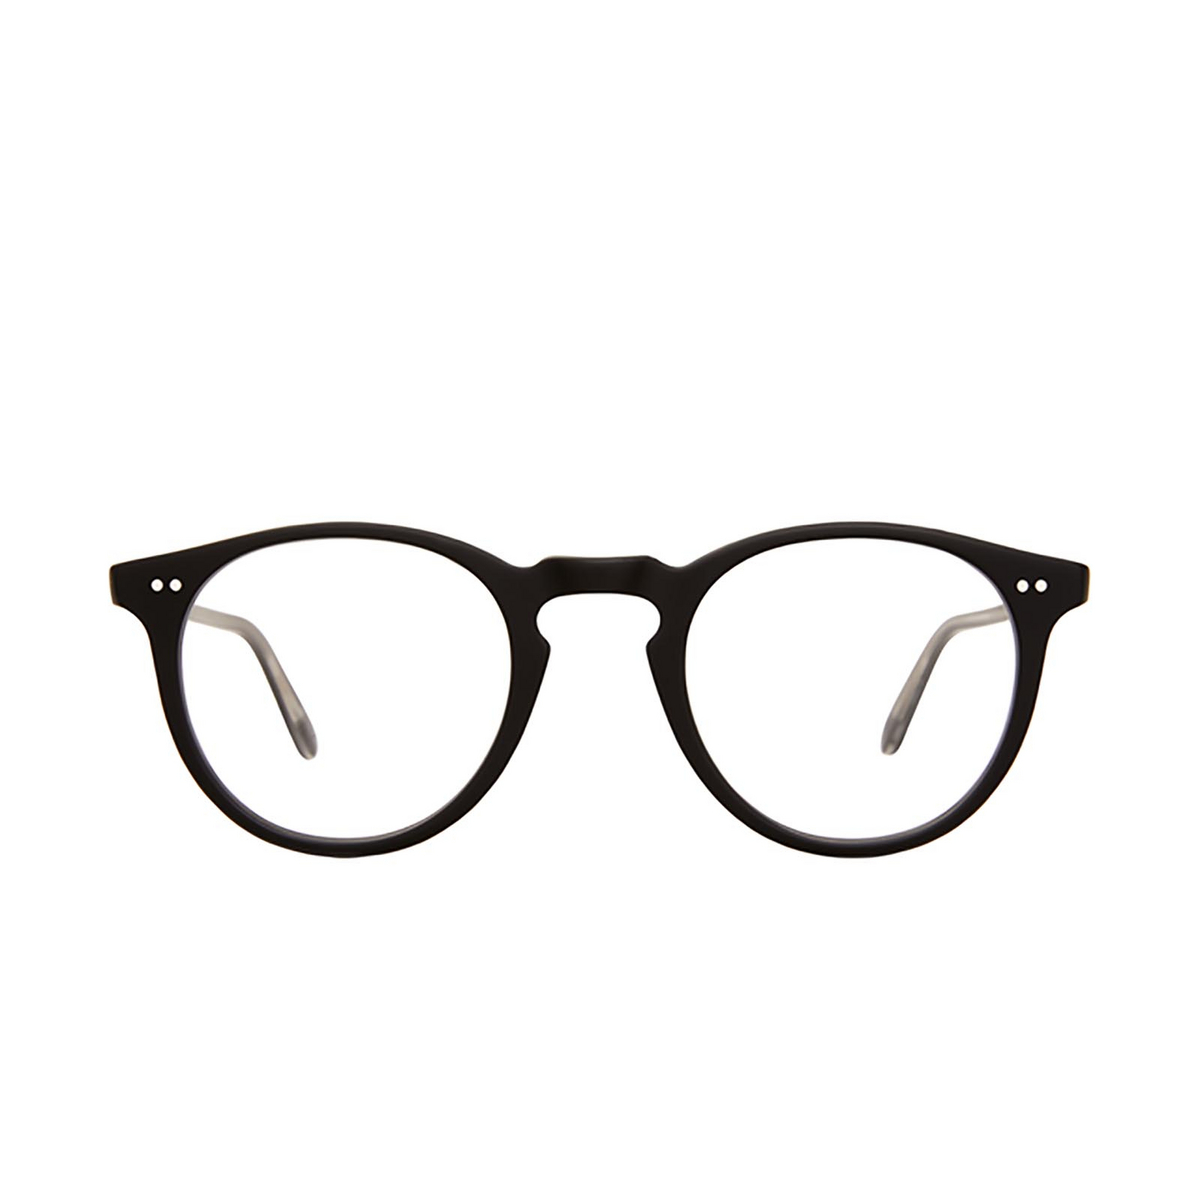 Garrett Leight® Round Eyeglasses: Glencoe color Matte Black Mbk - front view.